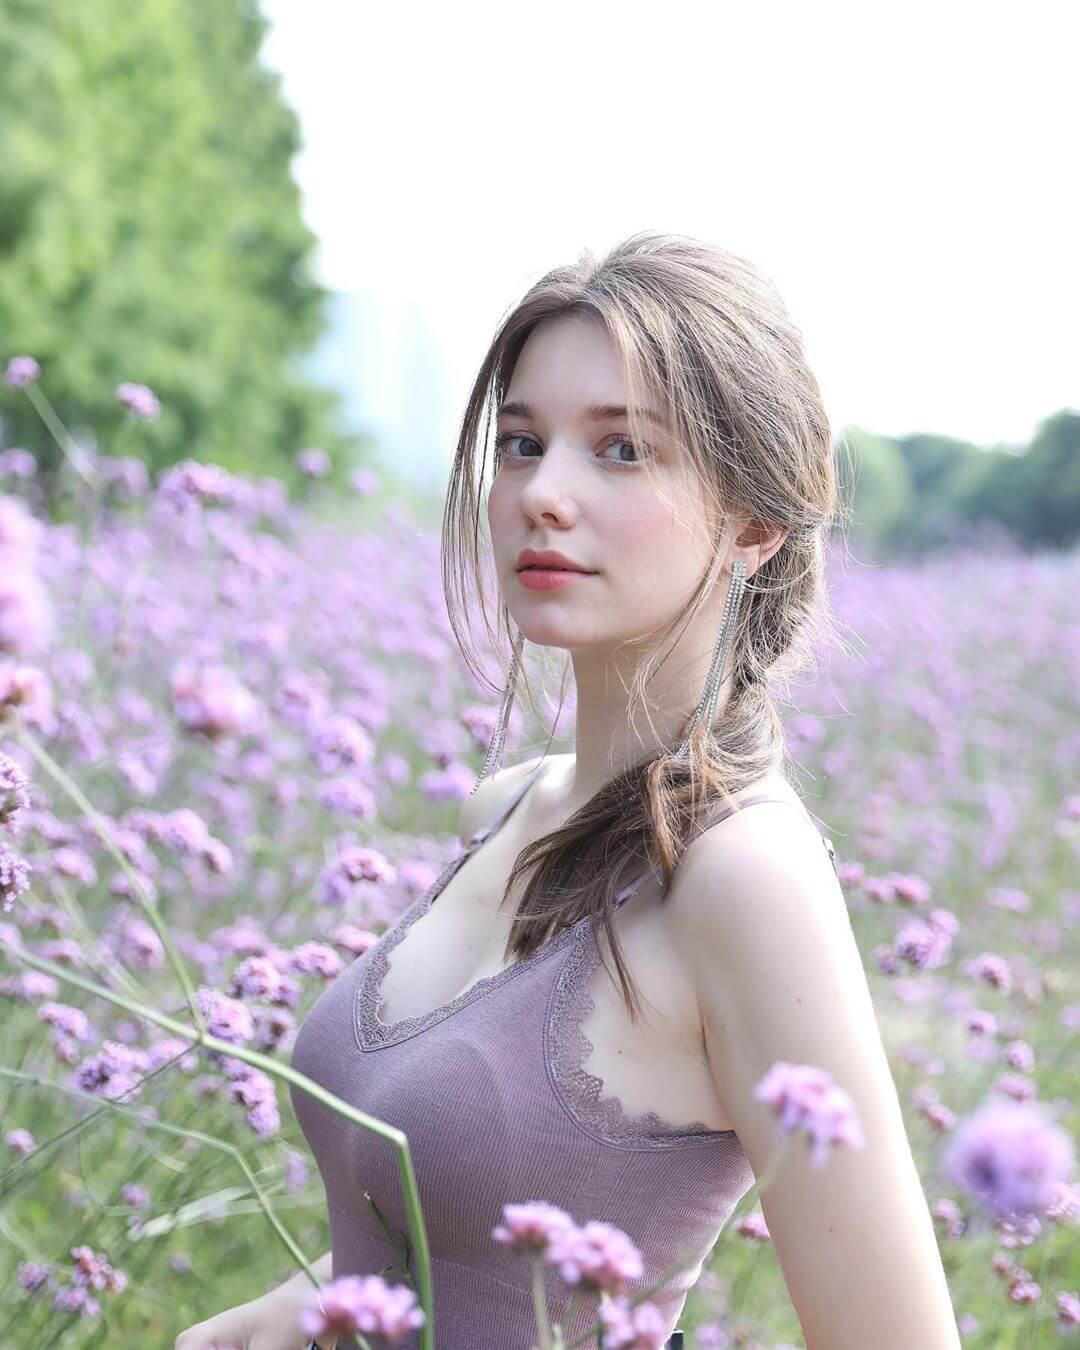 Anastasia Cebulska 秦妃